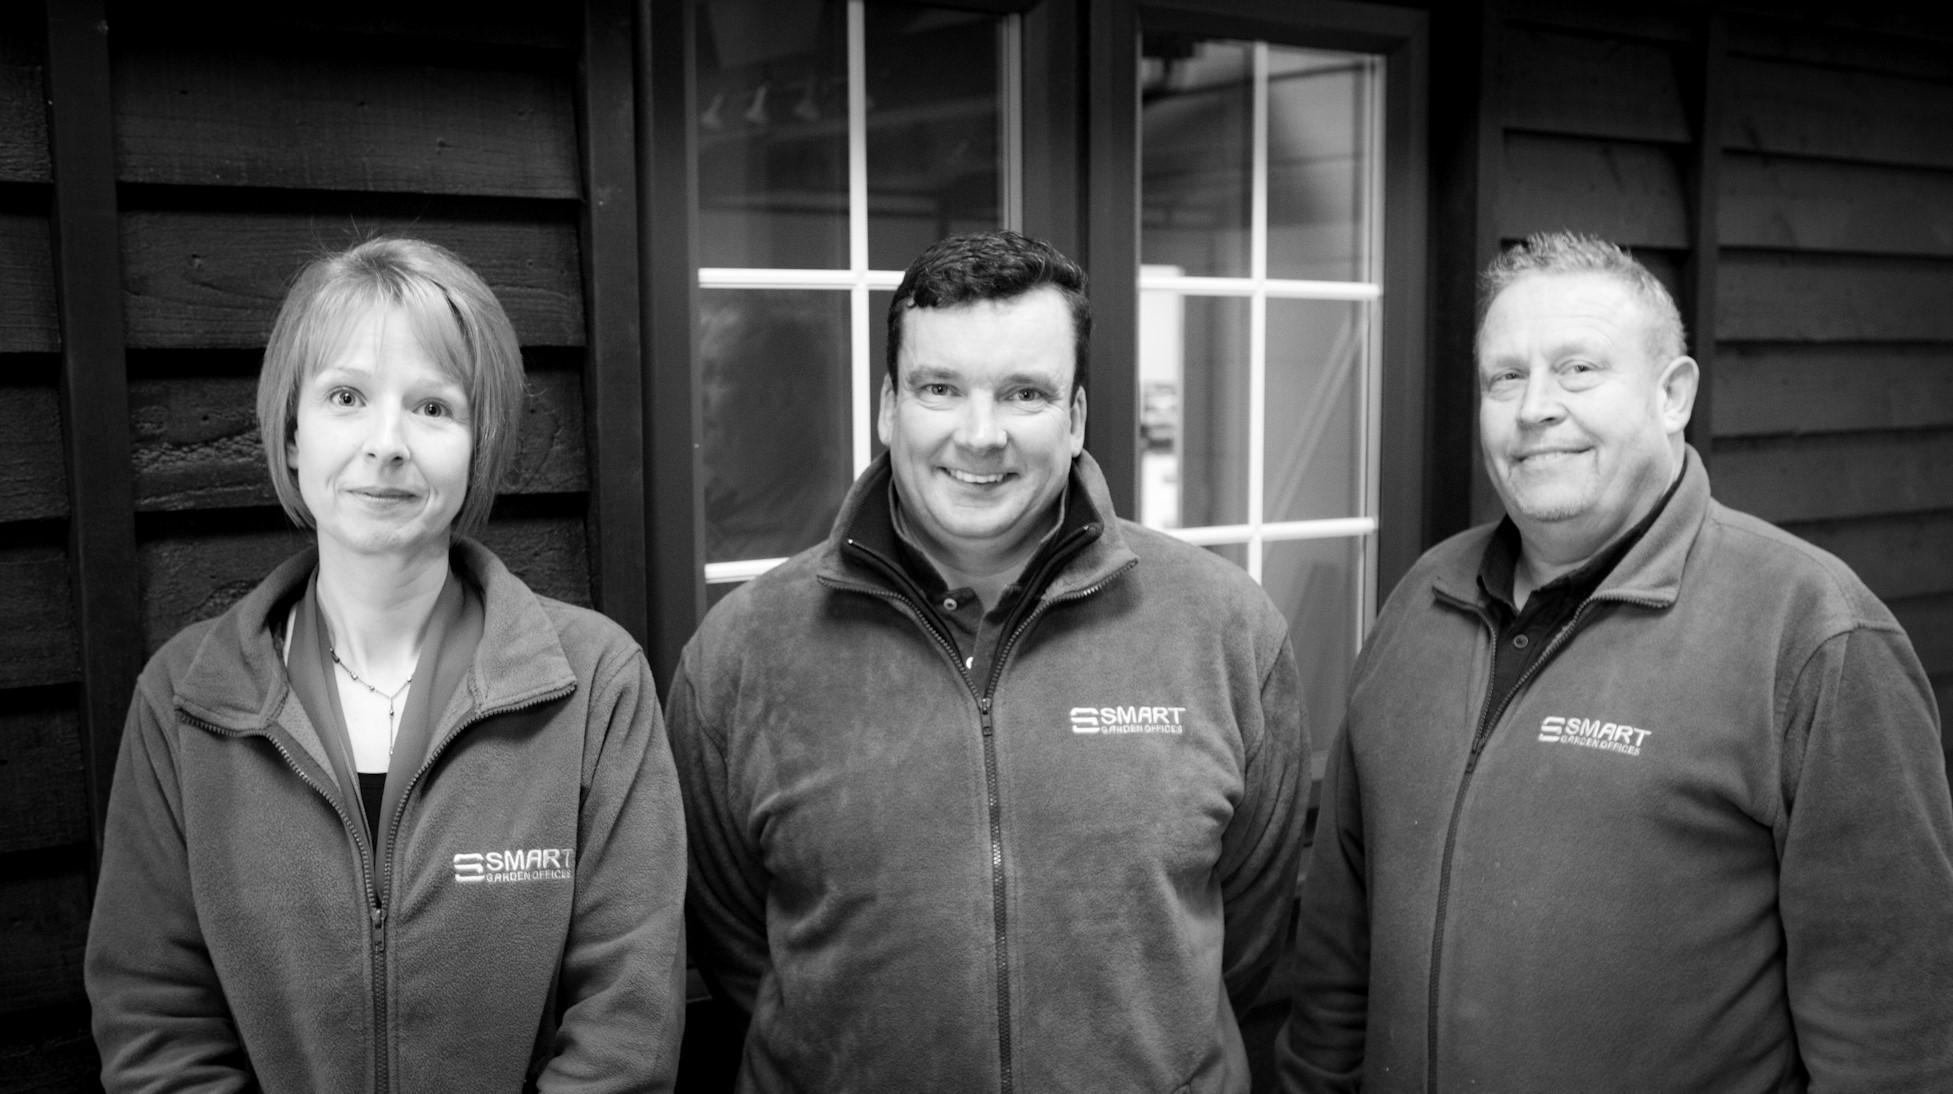 Smart Garden Offices - Debi Knott, Charlie Dalton, Tony Graves